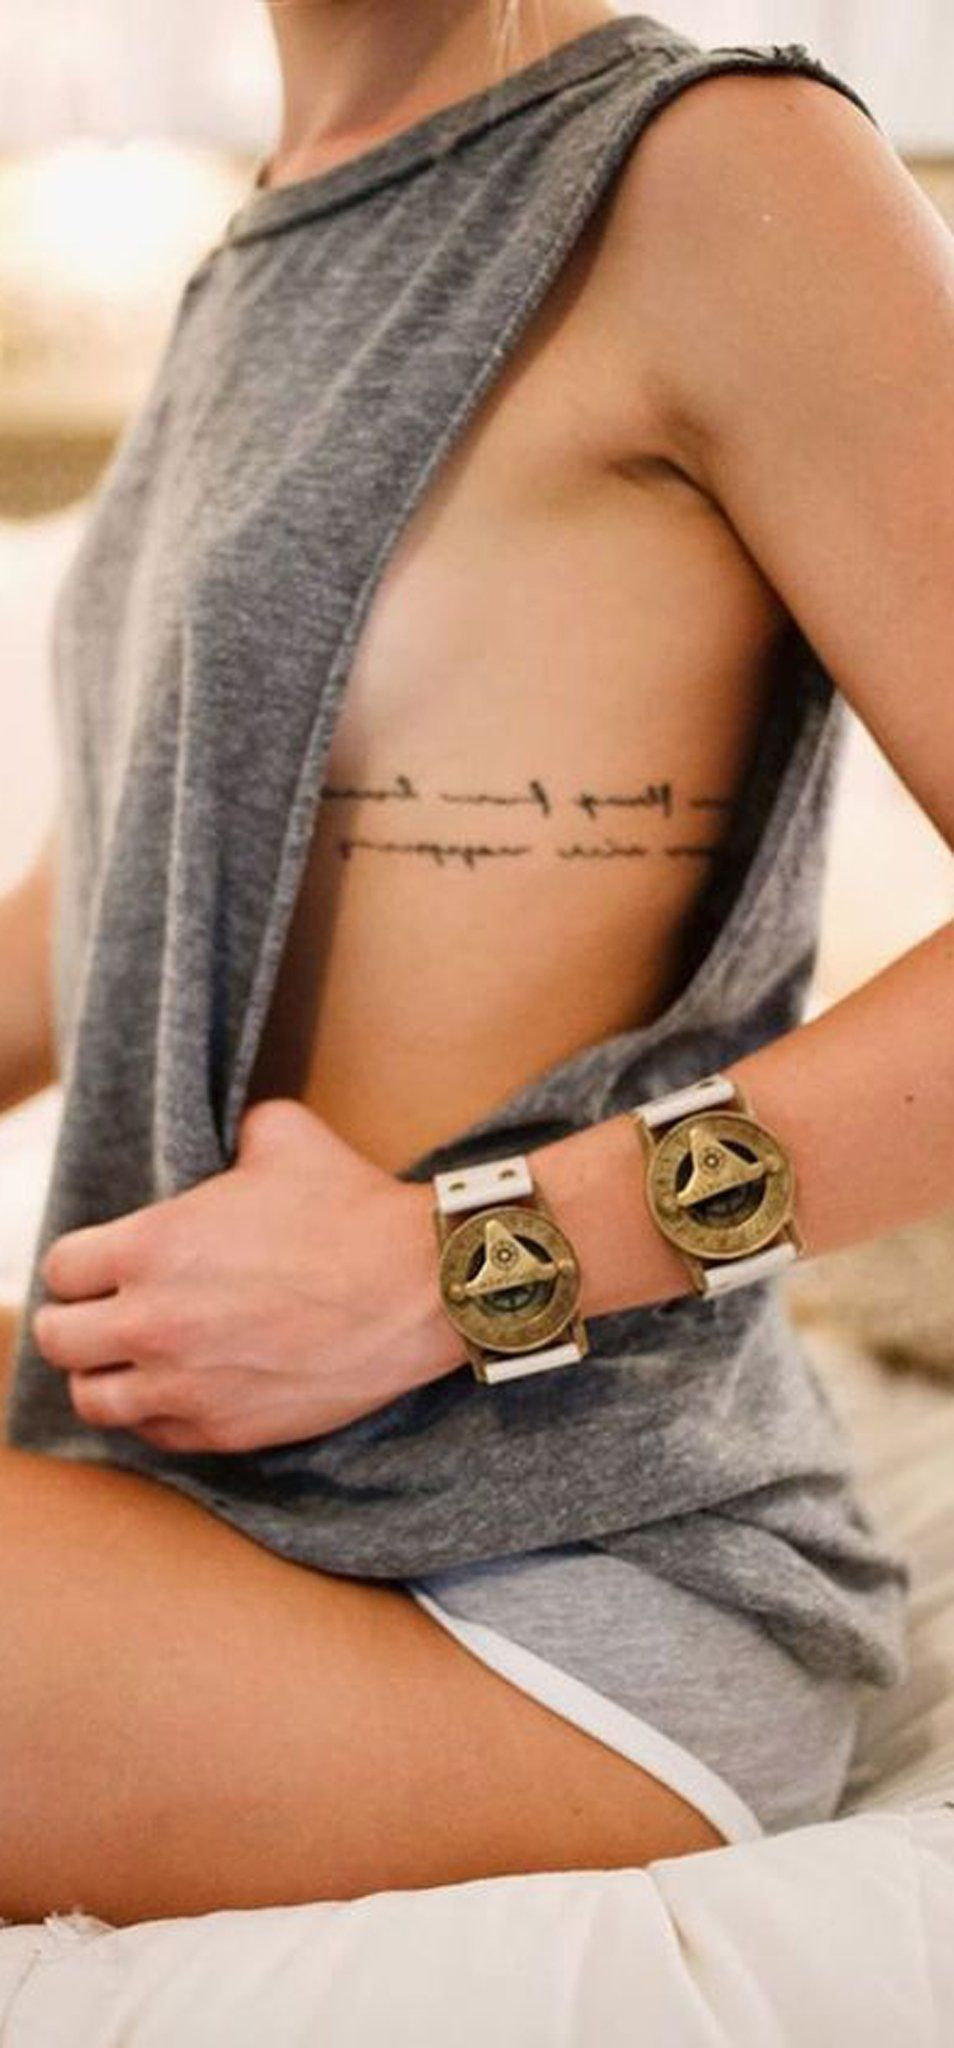 Small Script Rib Tattoo Ideas - Meaning Cursive Quote ideas ...